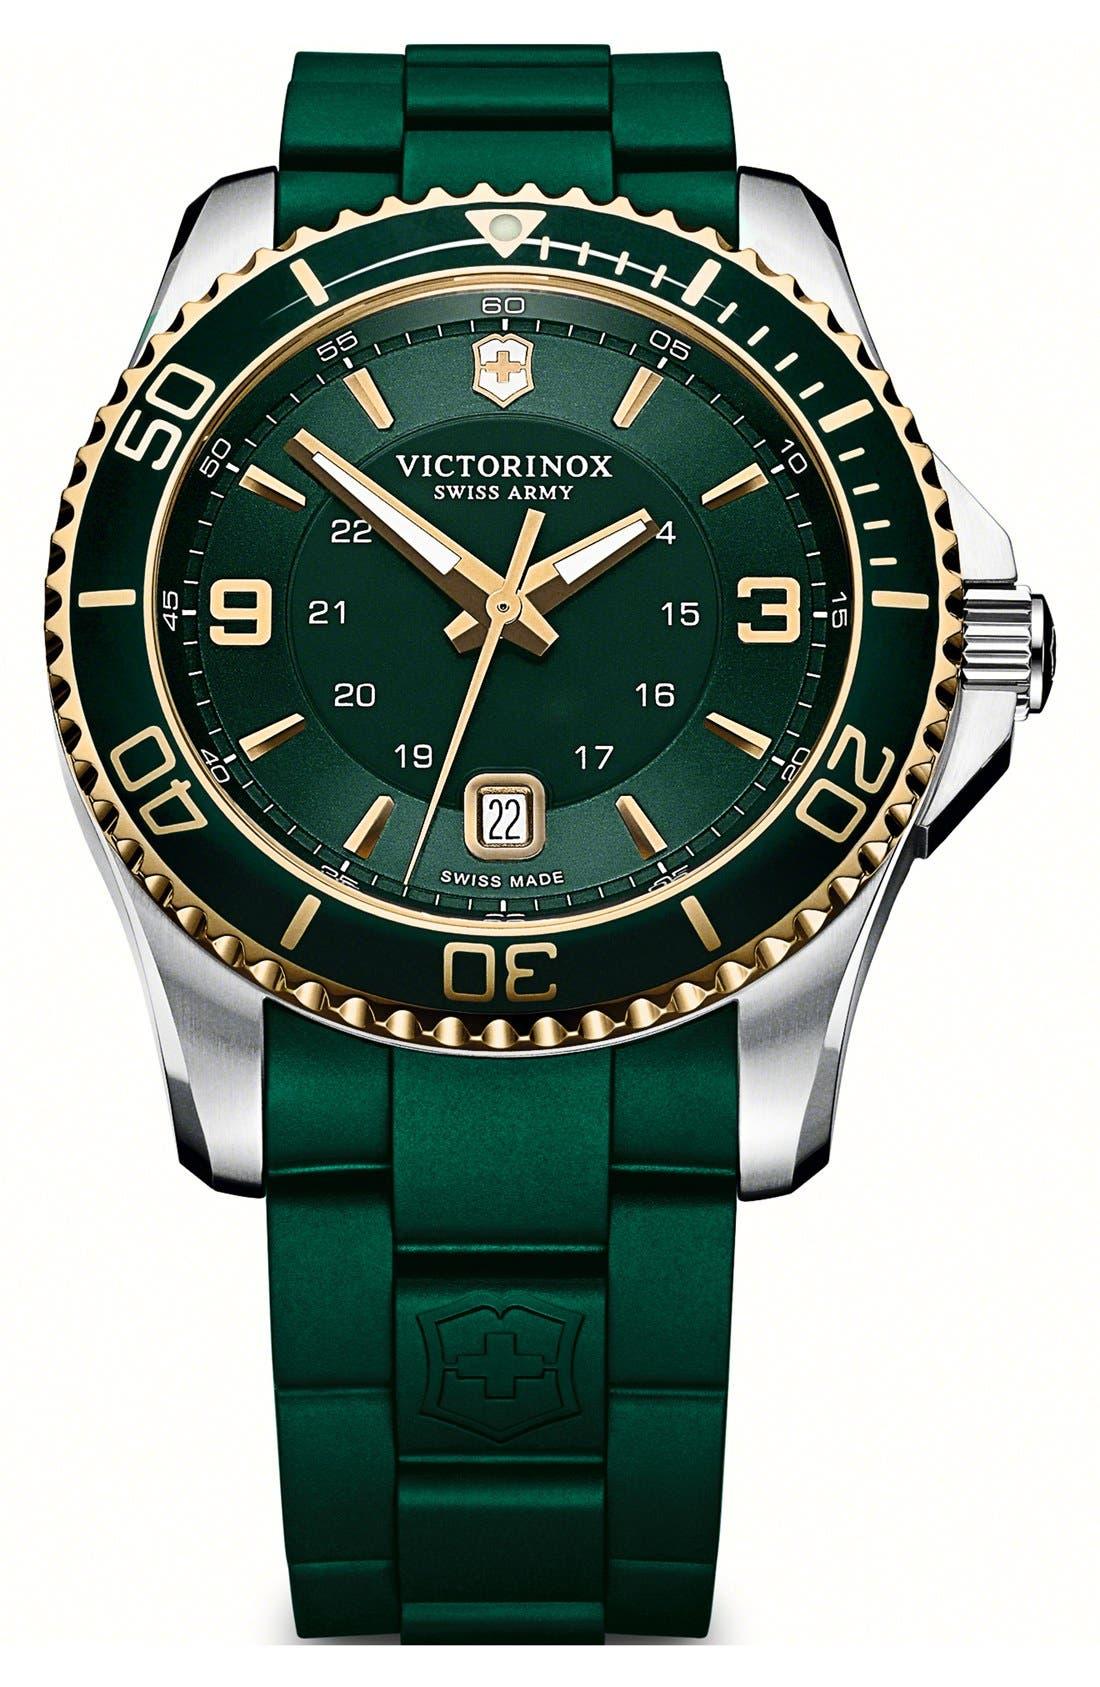 Alternate Image 1 Selected - Victorinox Swiss Army® 'Maverick GS' Rubber Strap Watch, 43mm